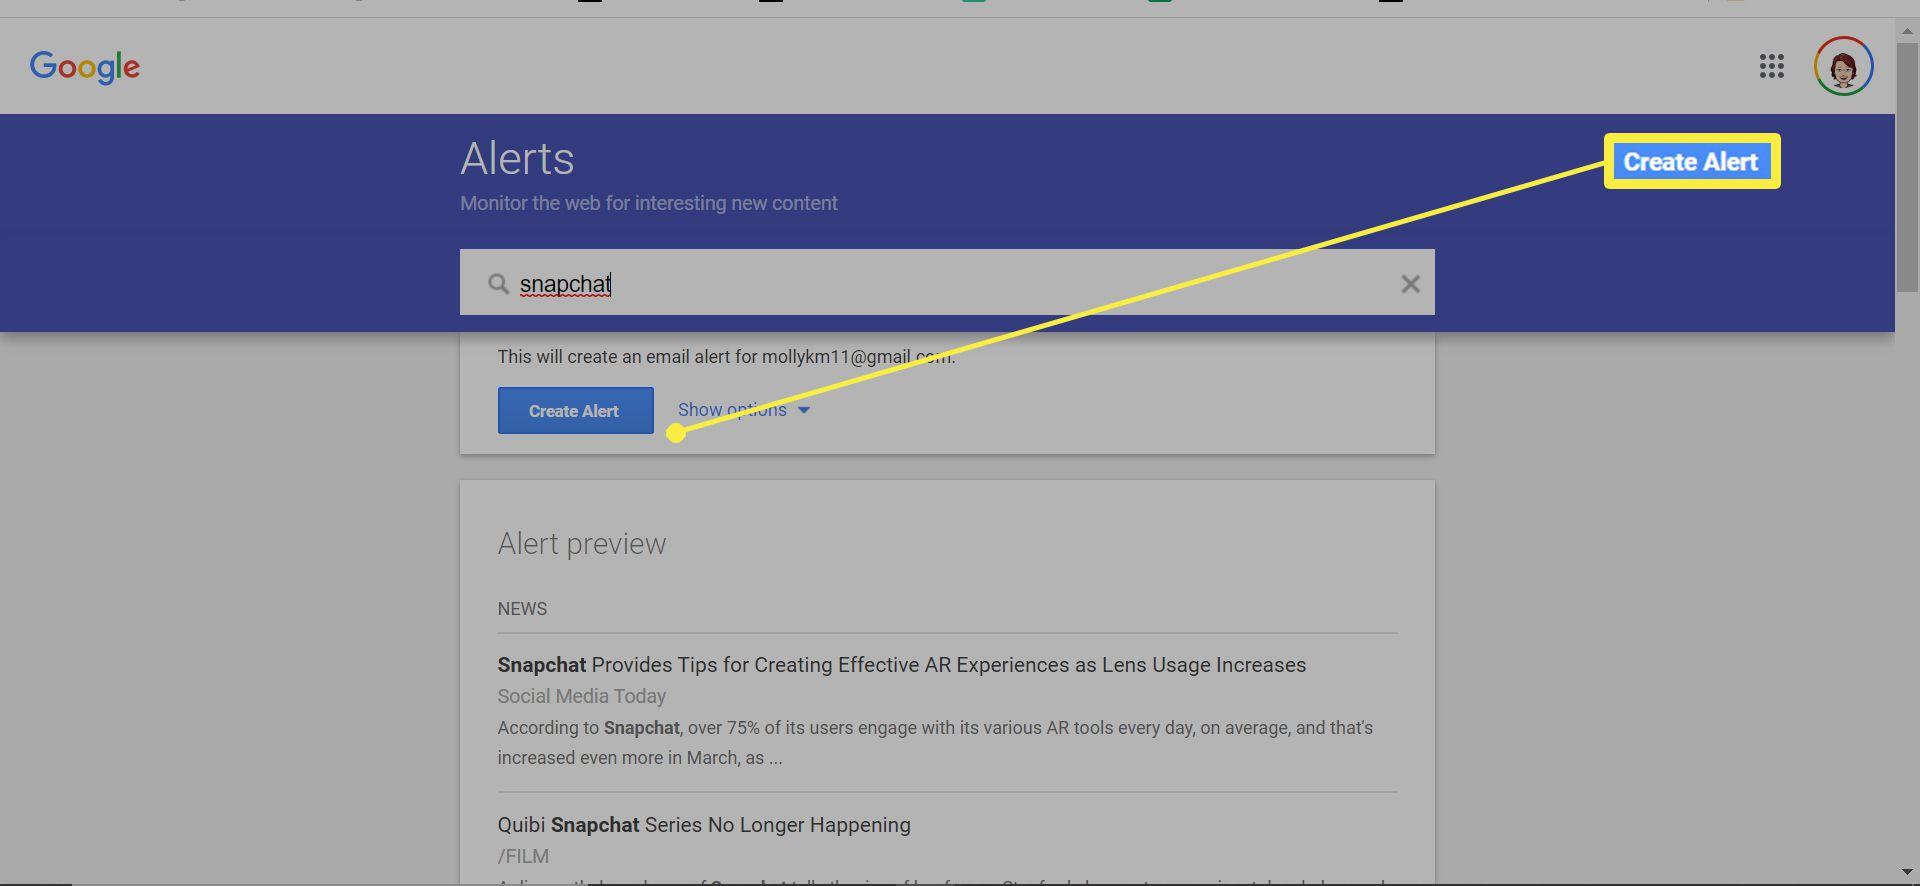 Creating a Google Alert for Snapchat.